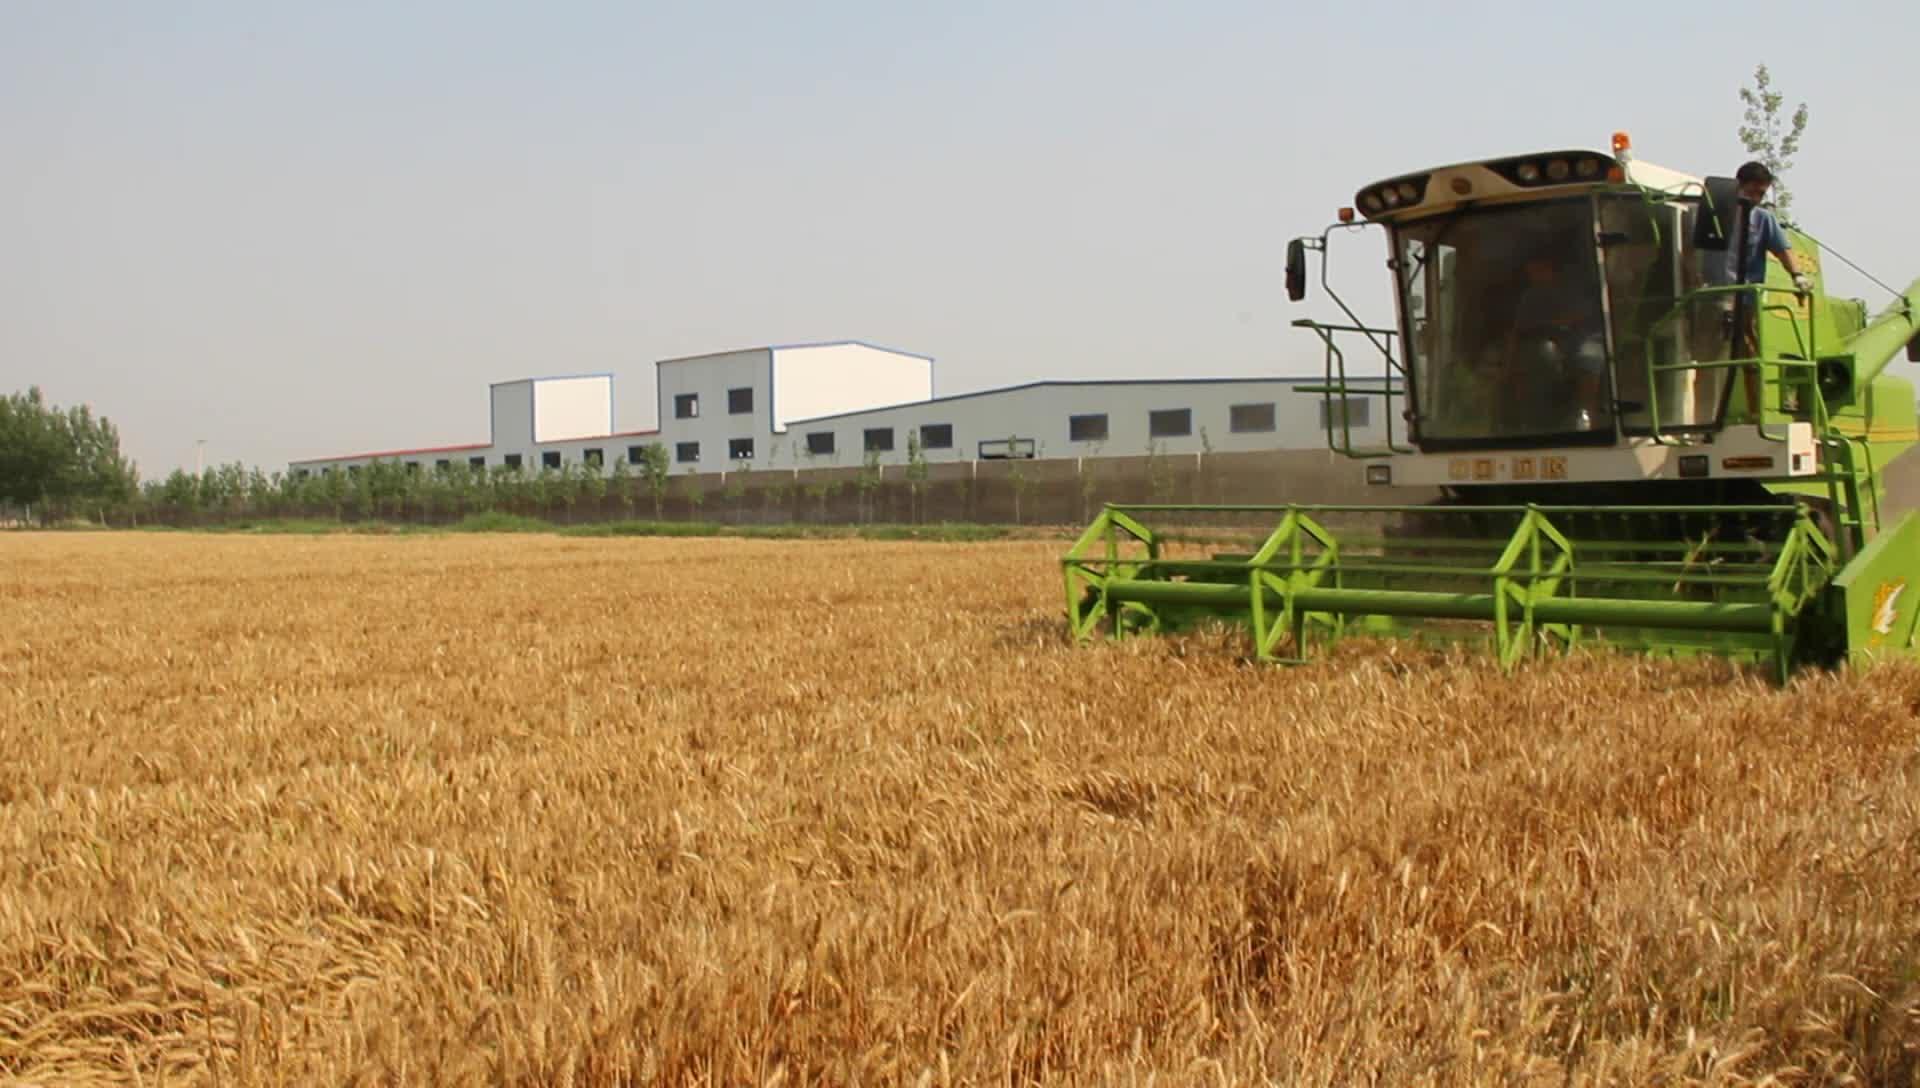 Grote tarwe/rijst maaidorser G60